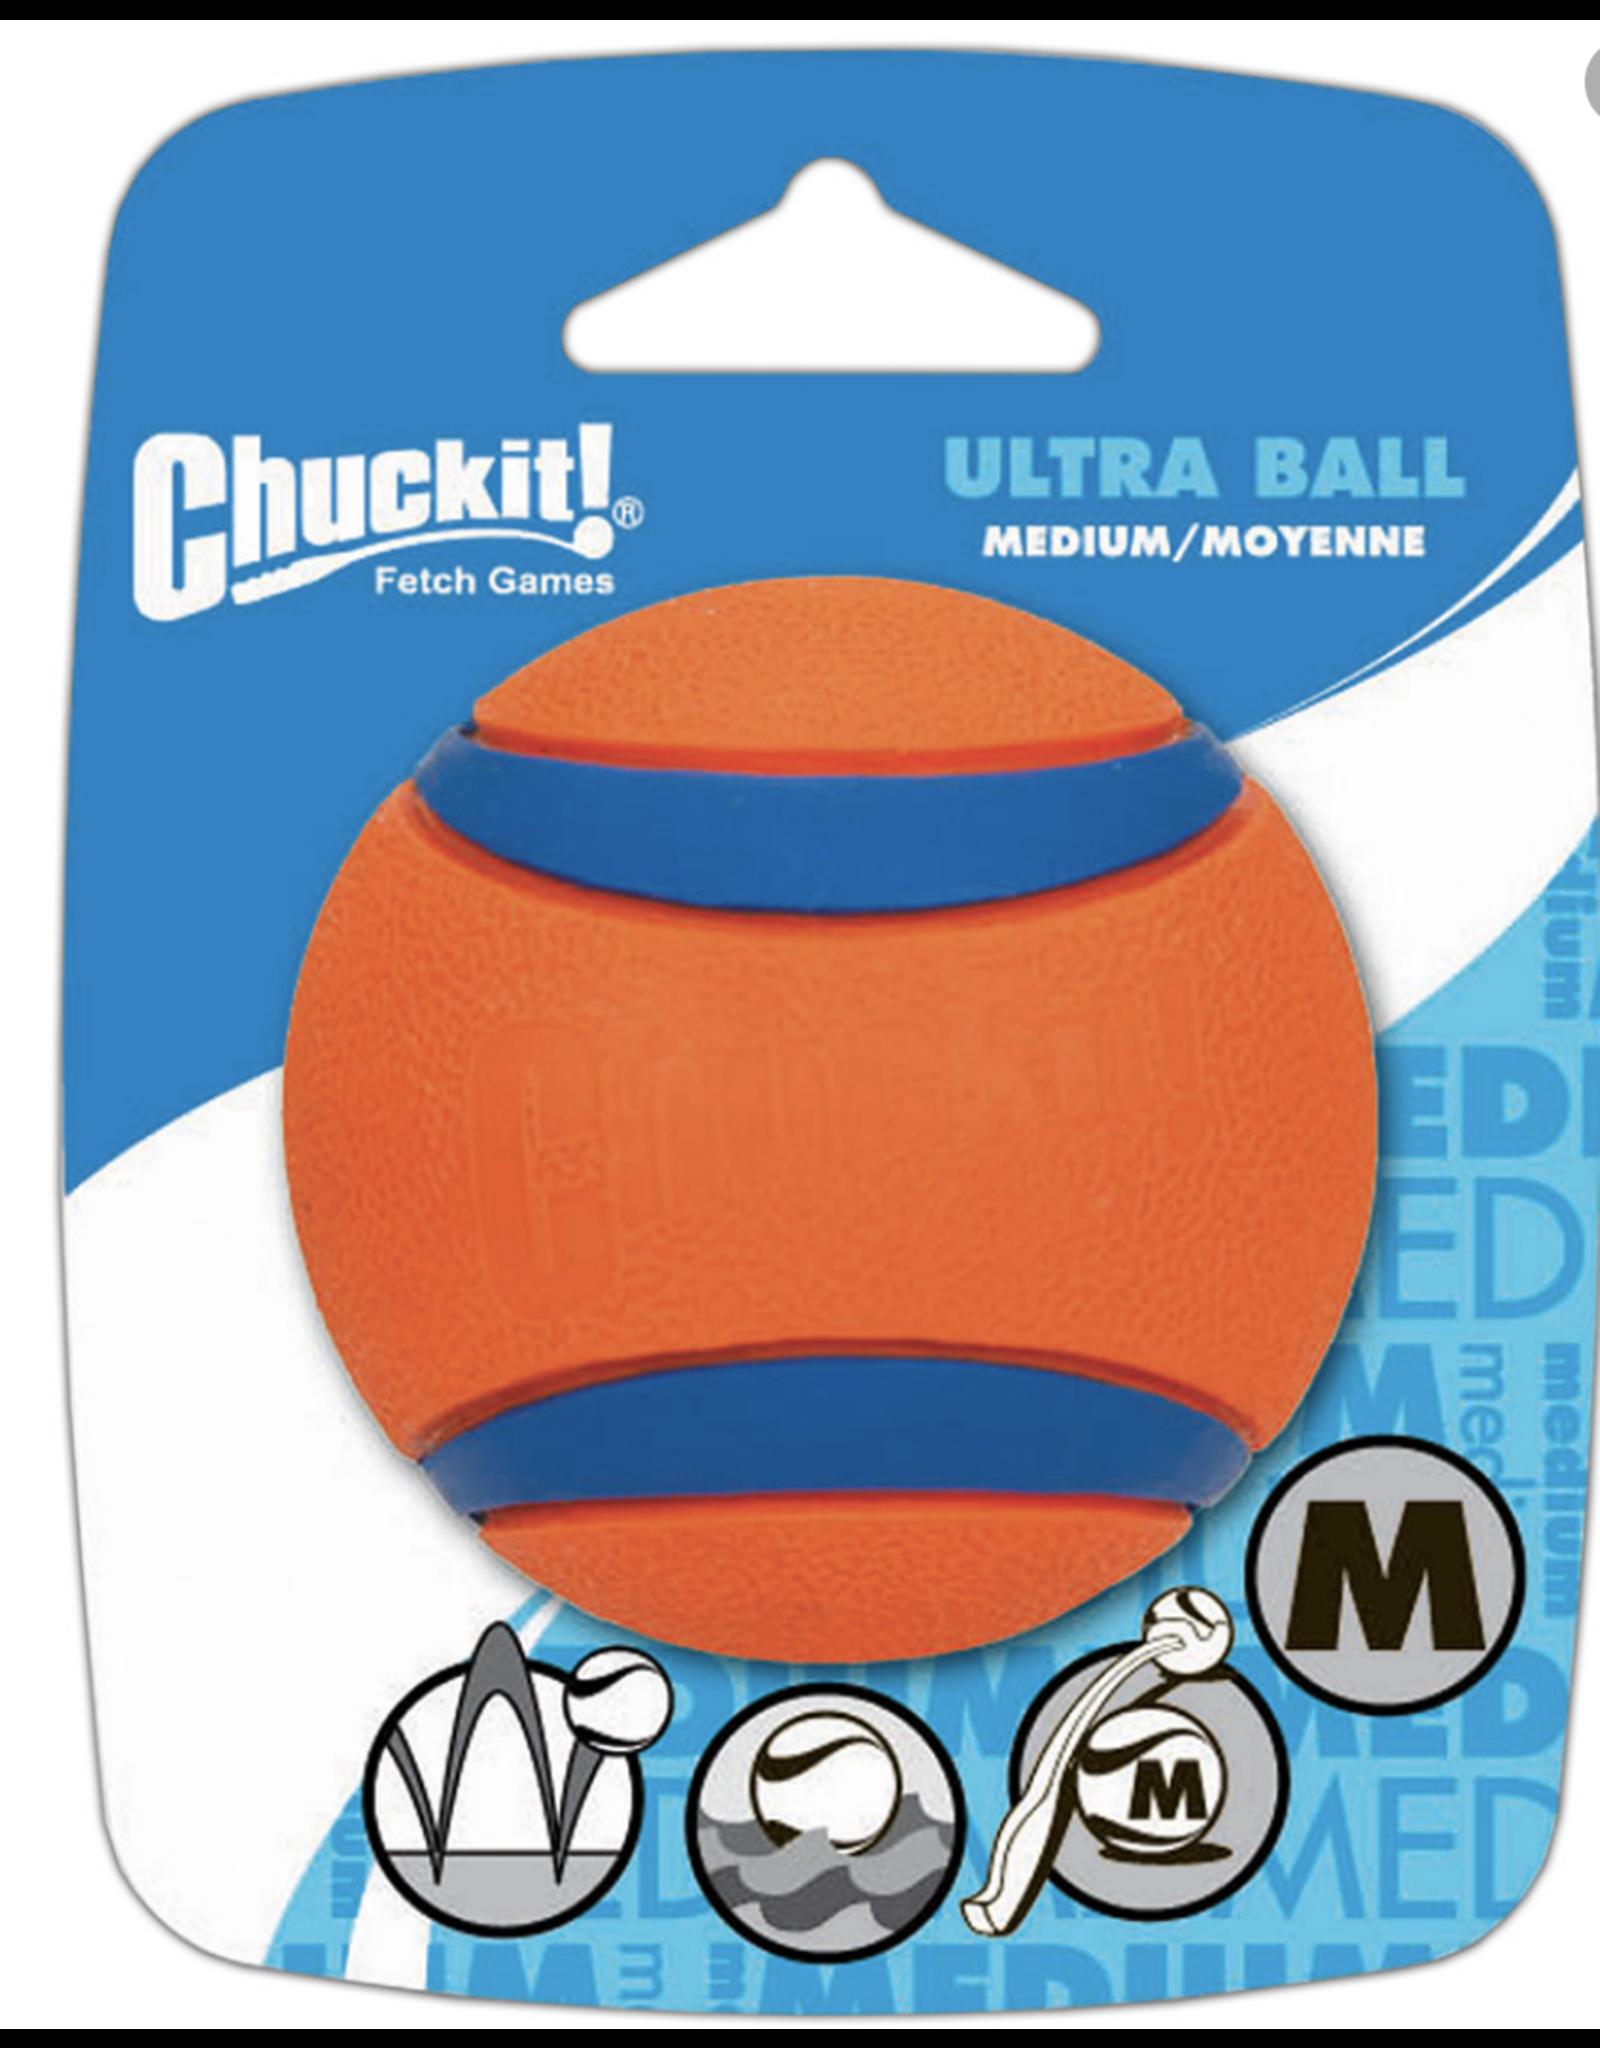 Chuckit Chuck It - Ultra Ball - 1 Pack - Med